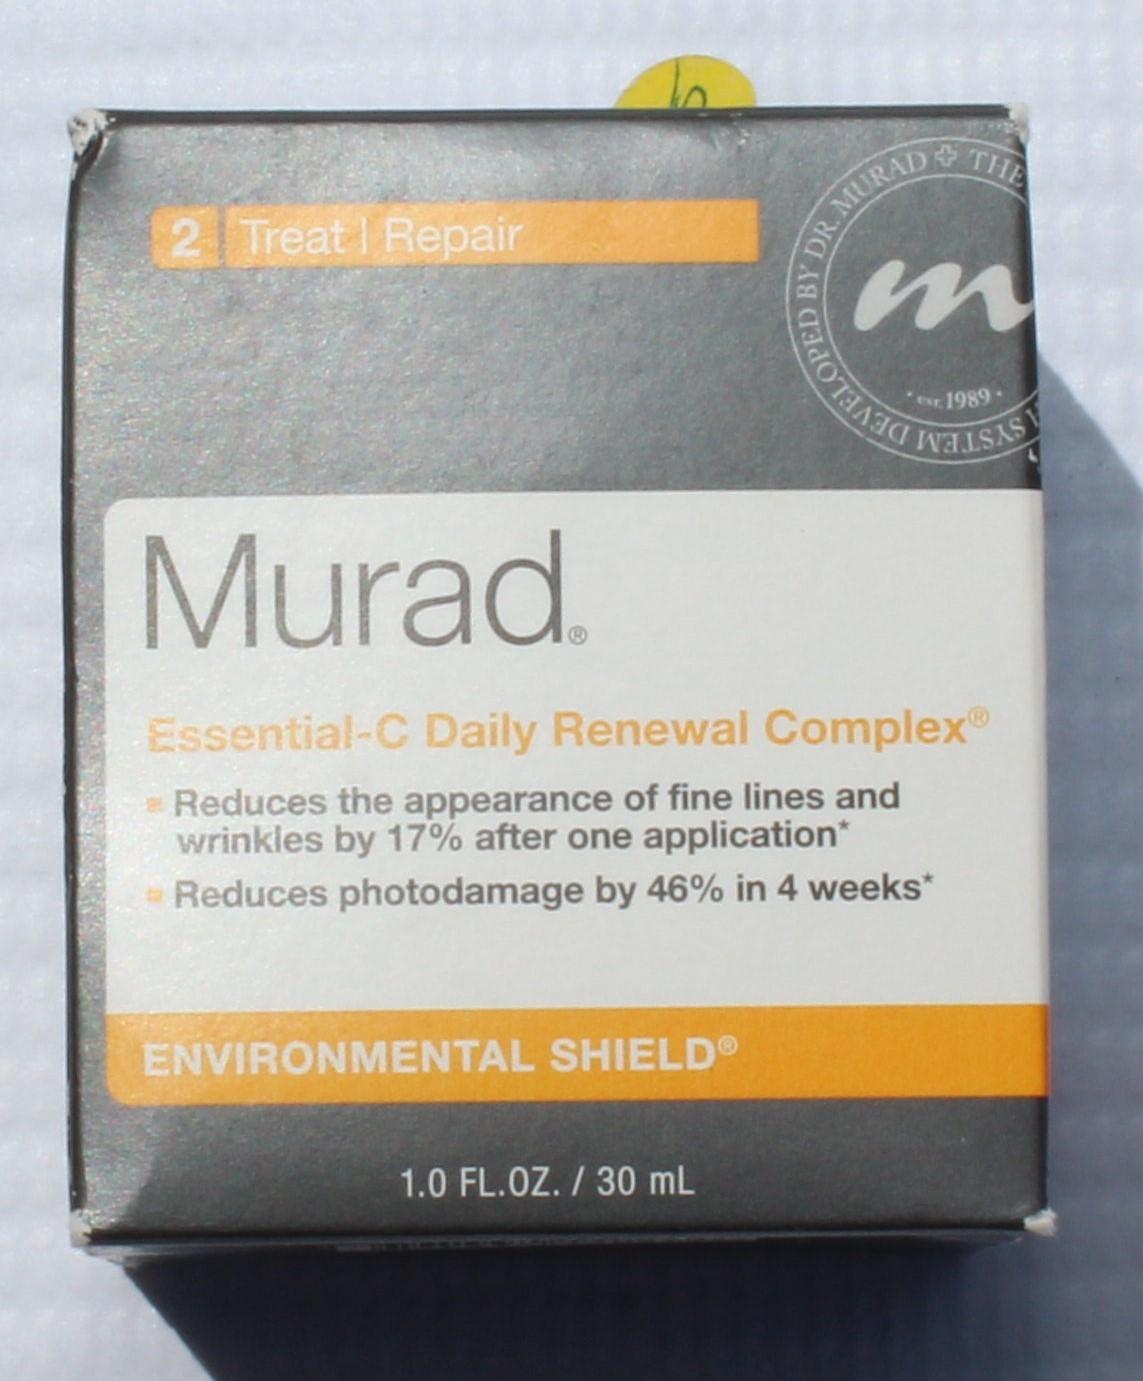 Essential-C Daily Renewal Complex